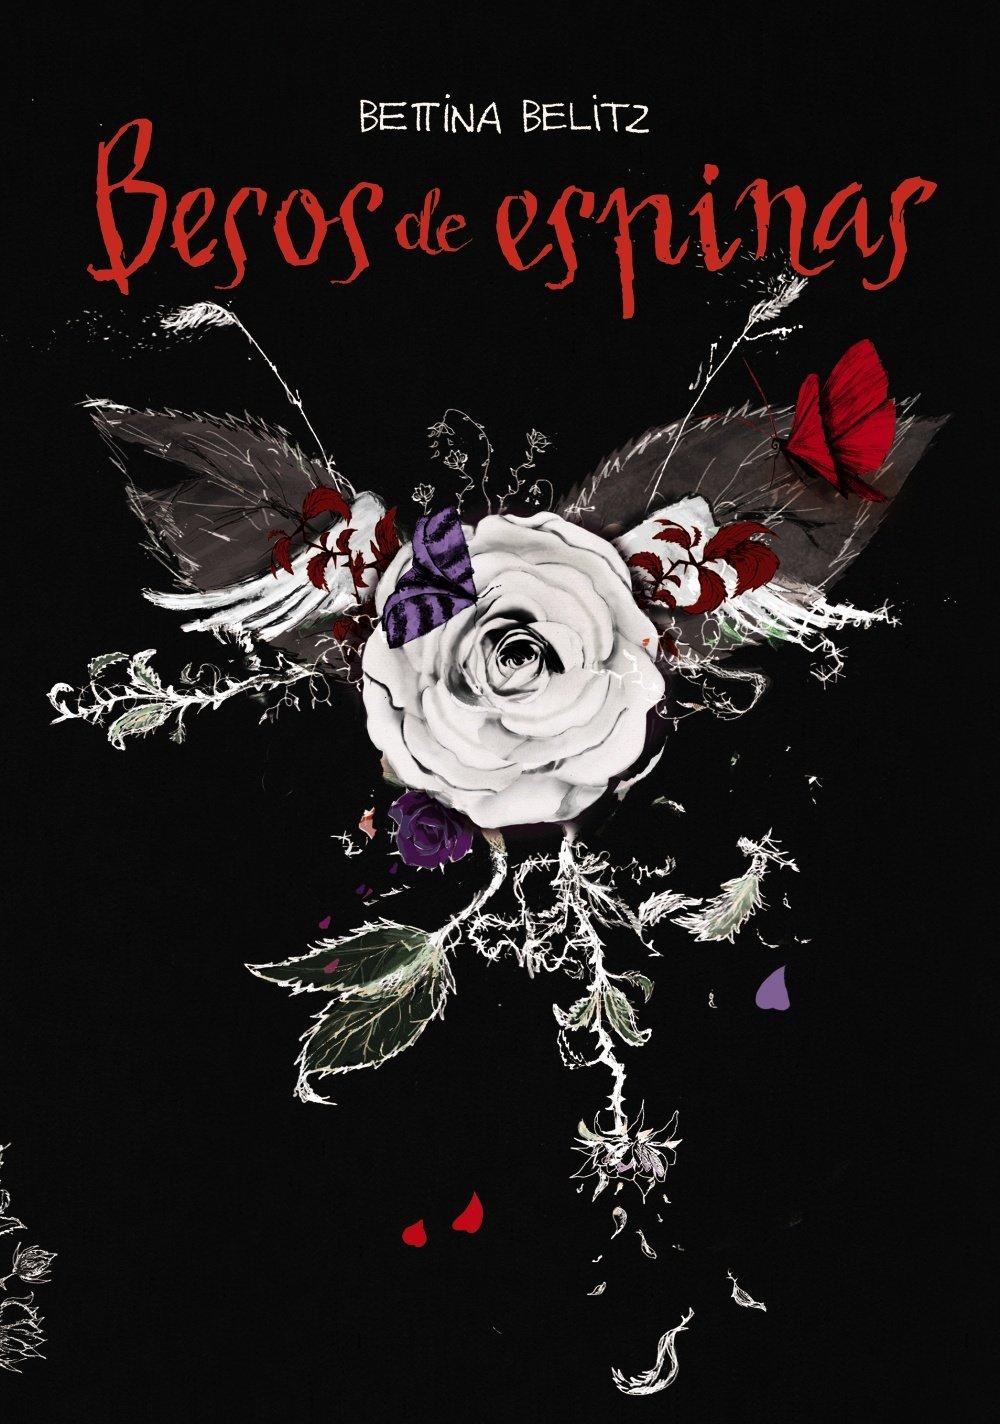 Besos de espinas Literatura Juvenil A Partir De 12 Años - Narrativa Juvenil: Amazon.es: Bettina Belitz, Carmen Bas Álvarez: Libros